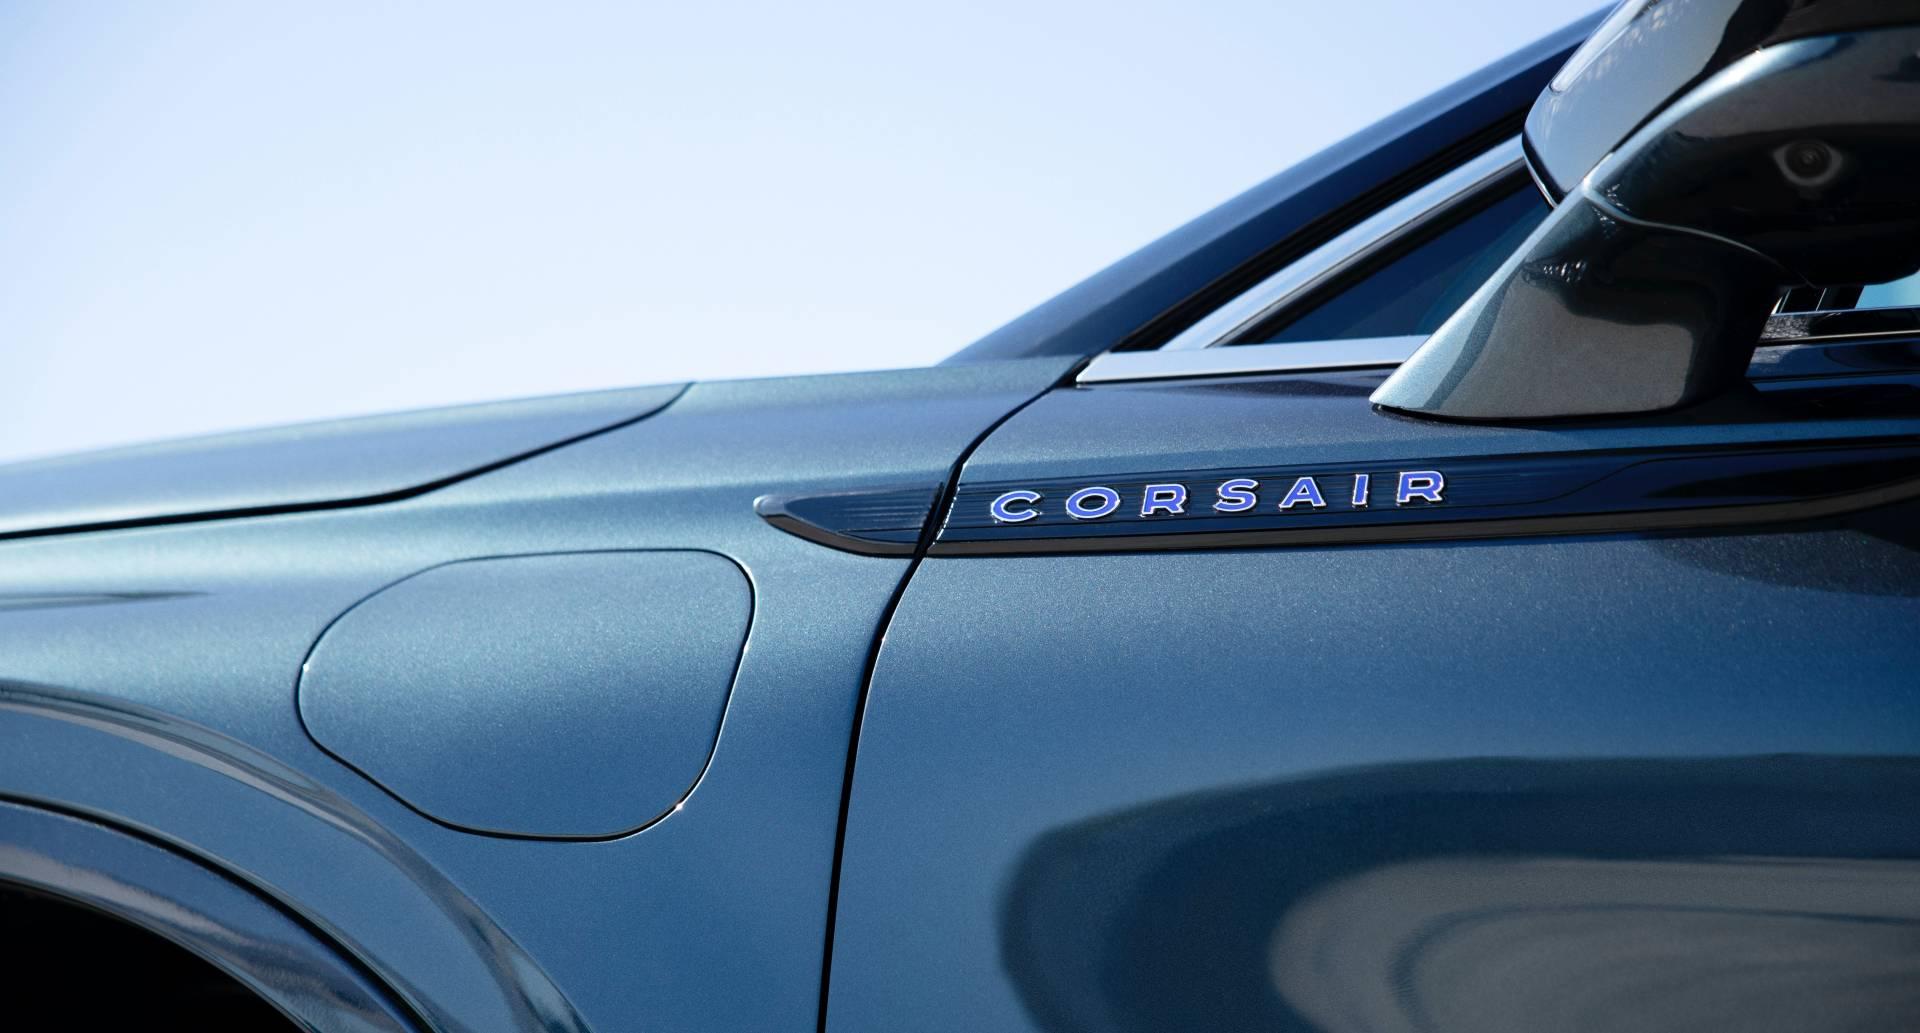 Lincoln-Corsair-Grand-Touring-2020-32